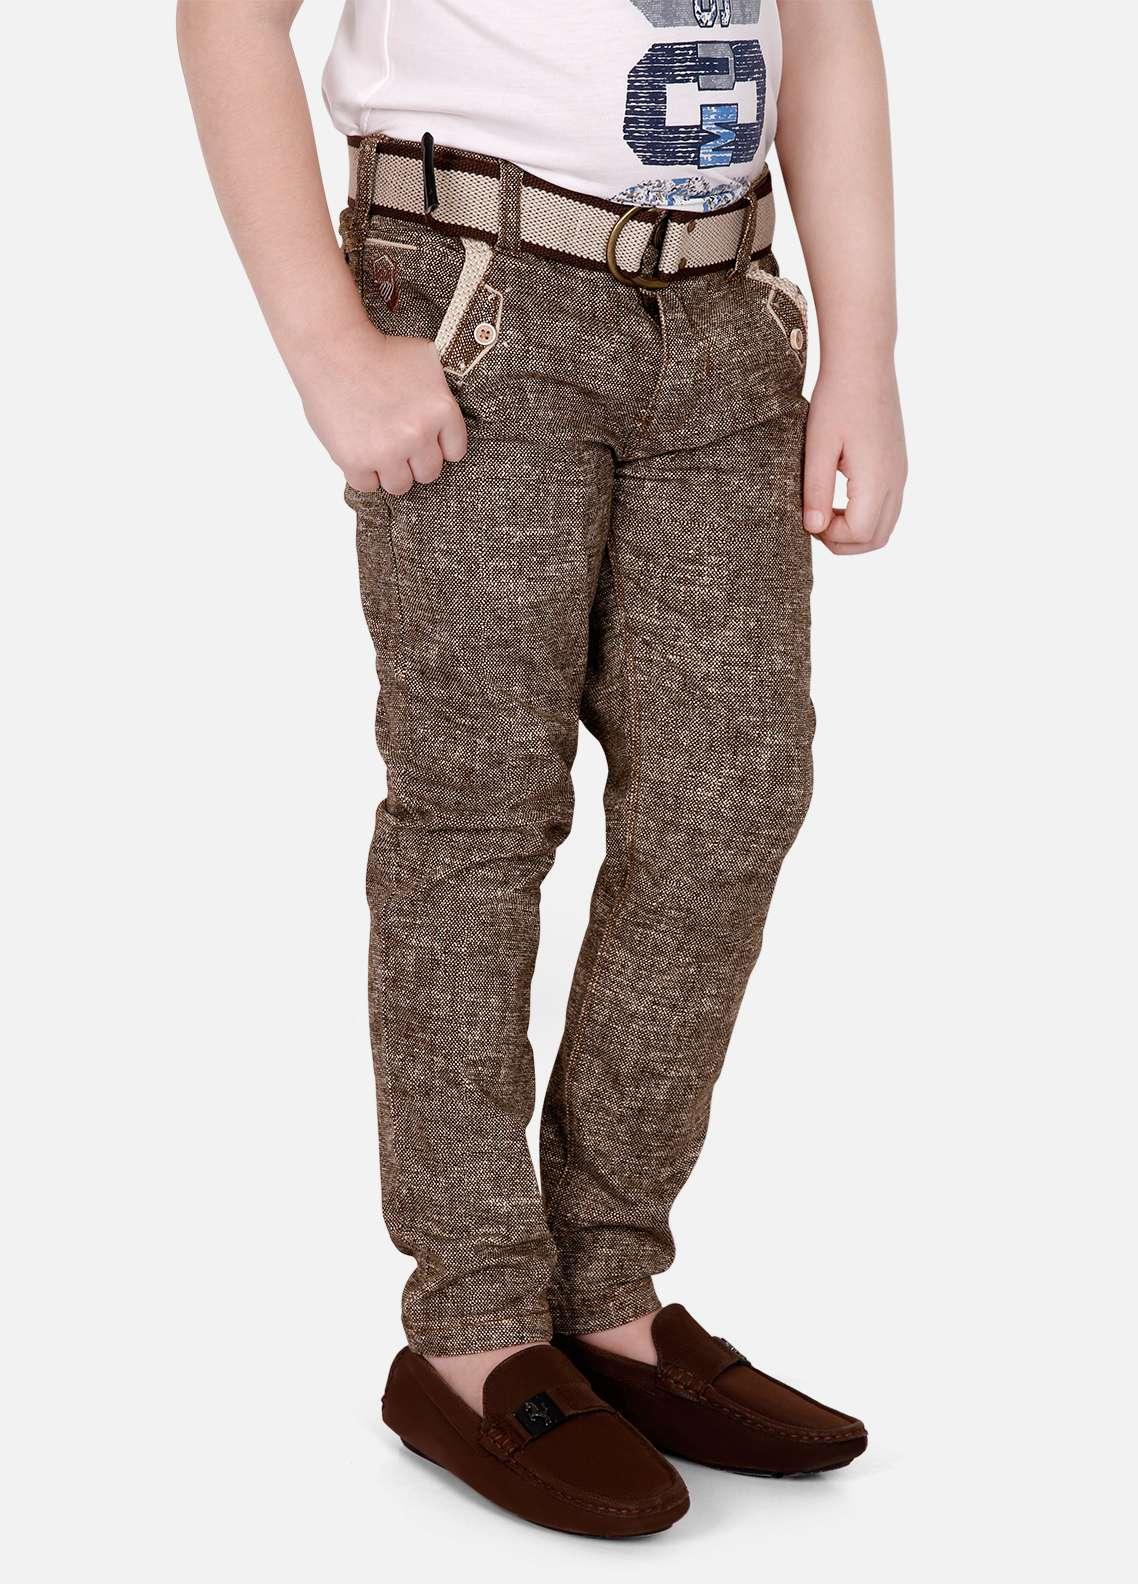 Edenrobe Cotton Plain Texture Pants for Boys - Brown EDK18P 5718